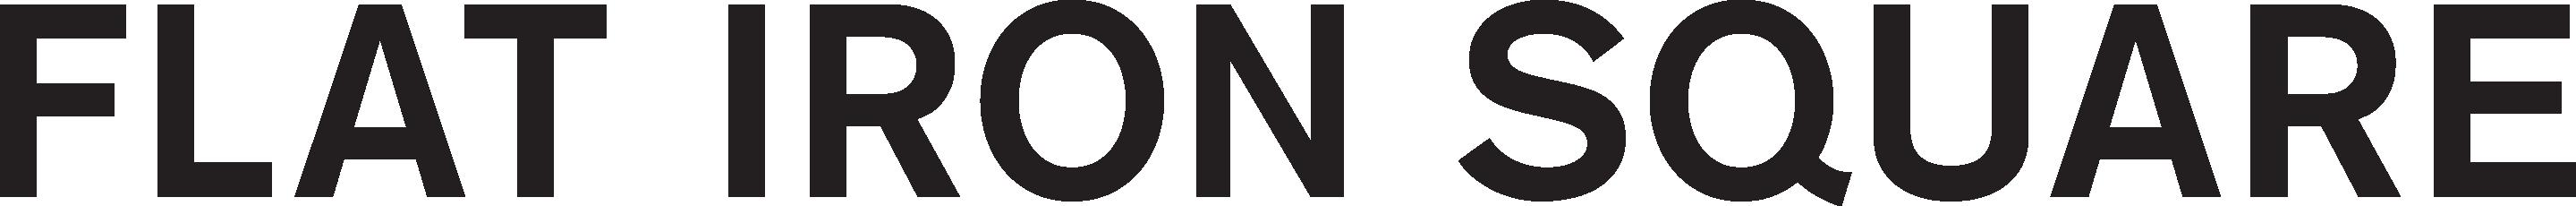 Square logo. Hot clipart flat iron